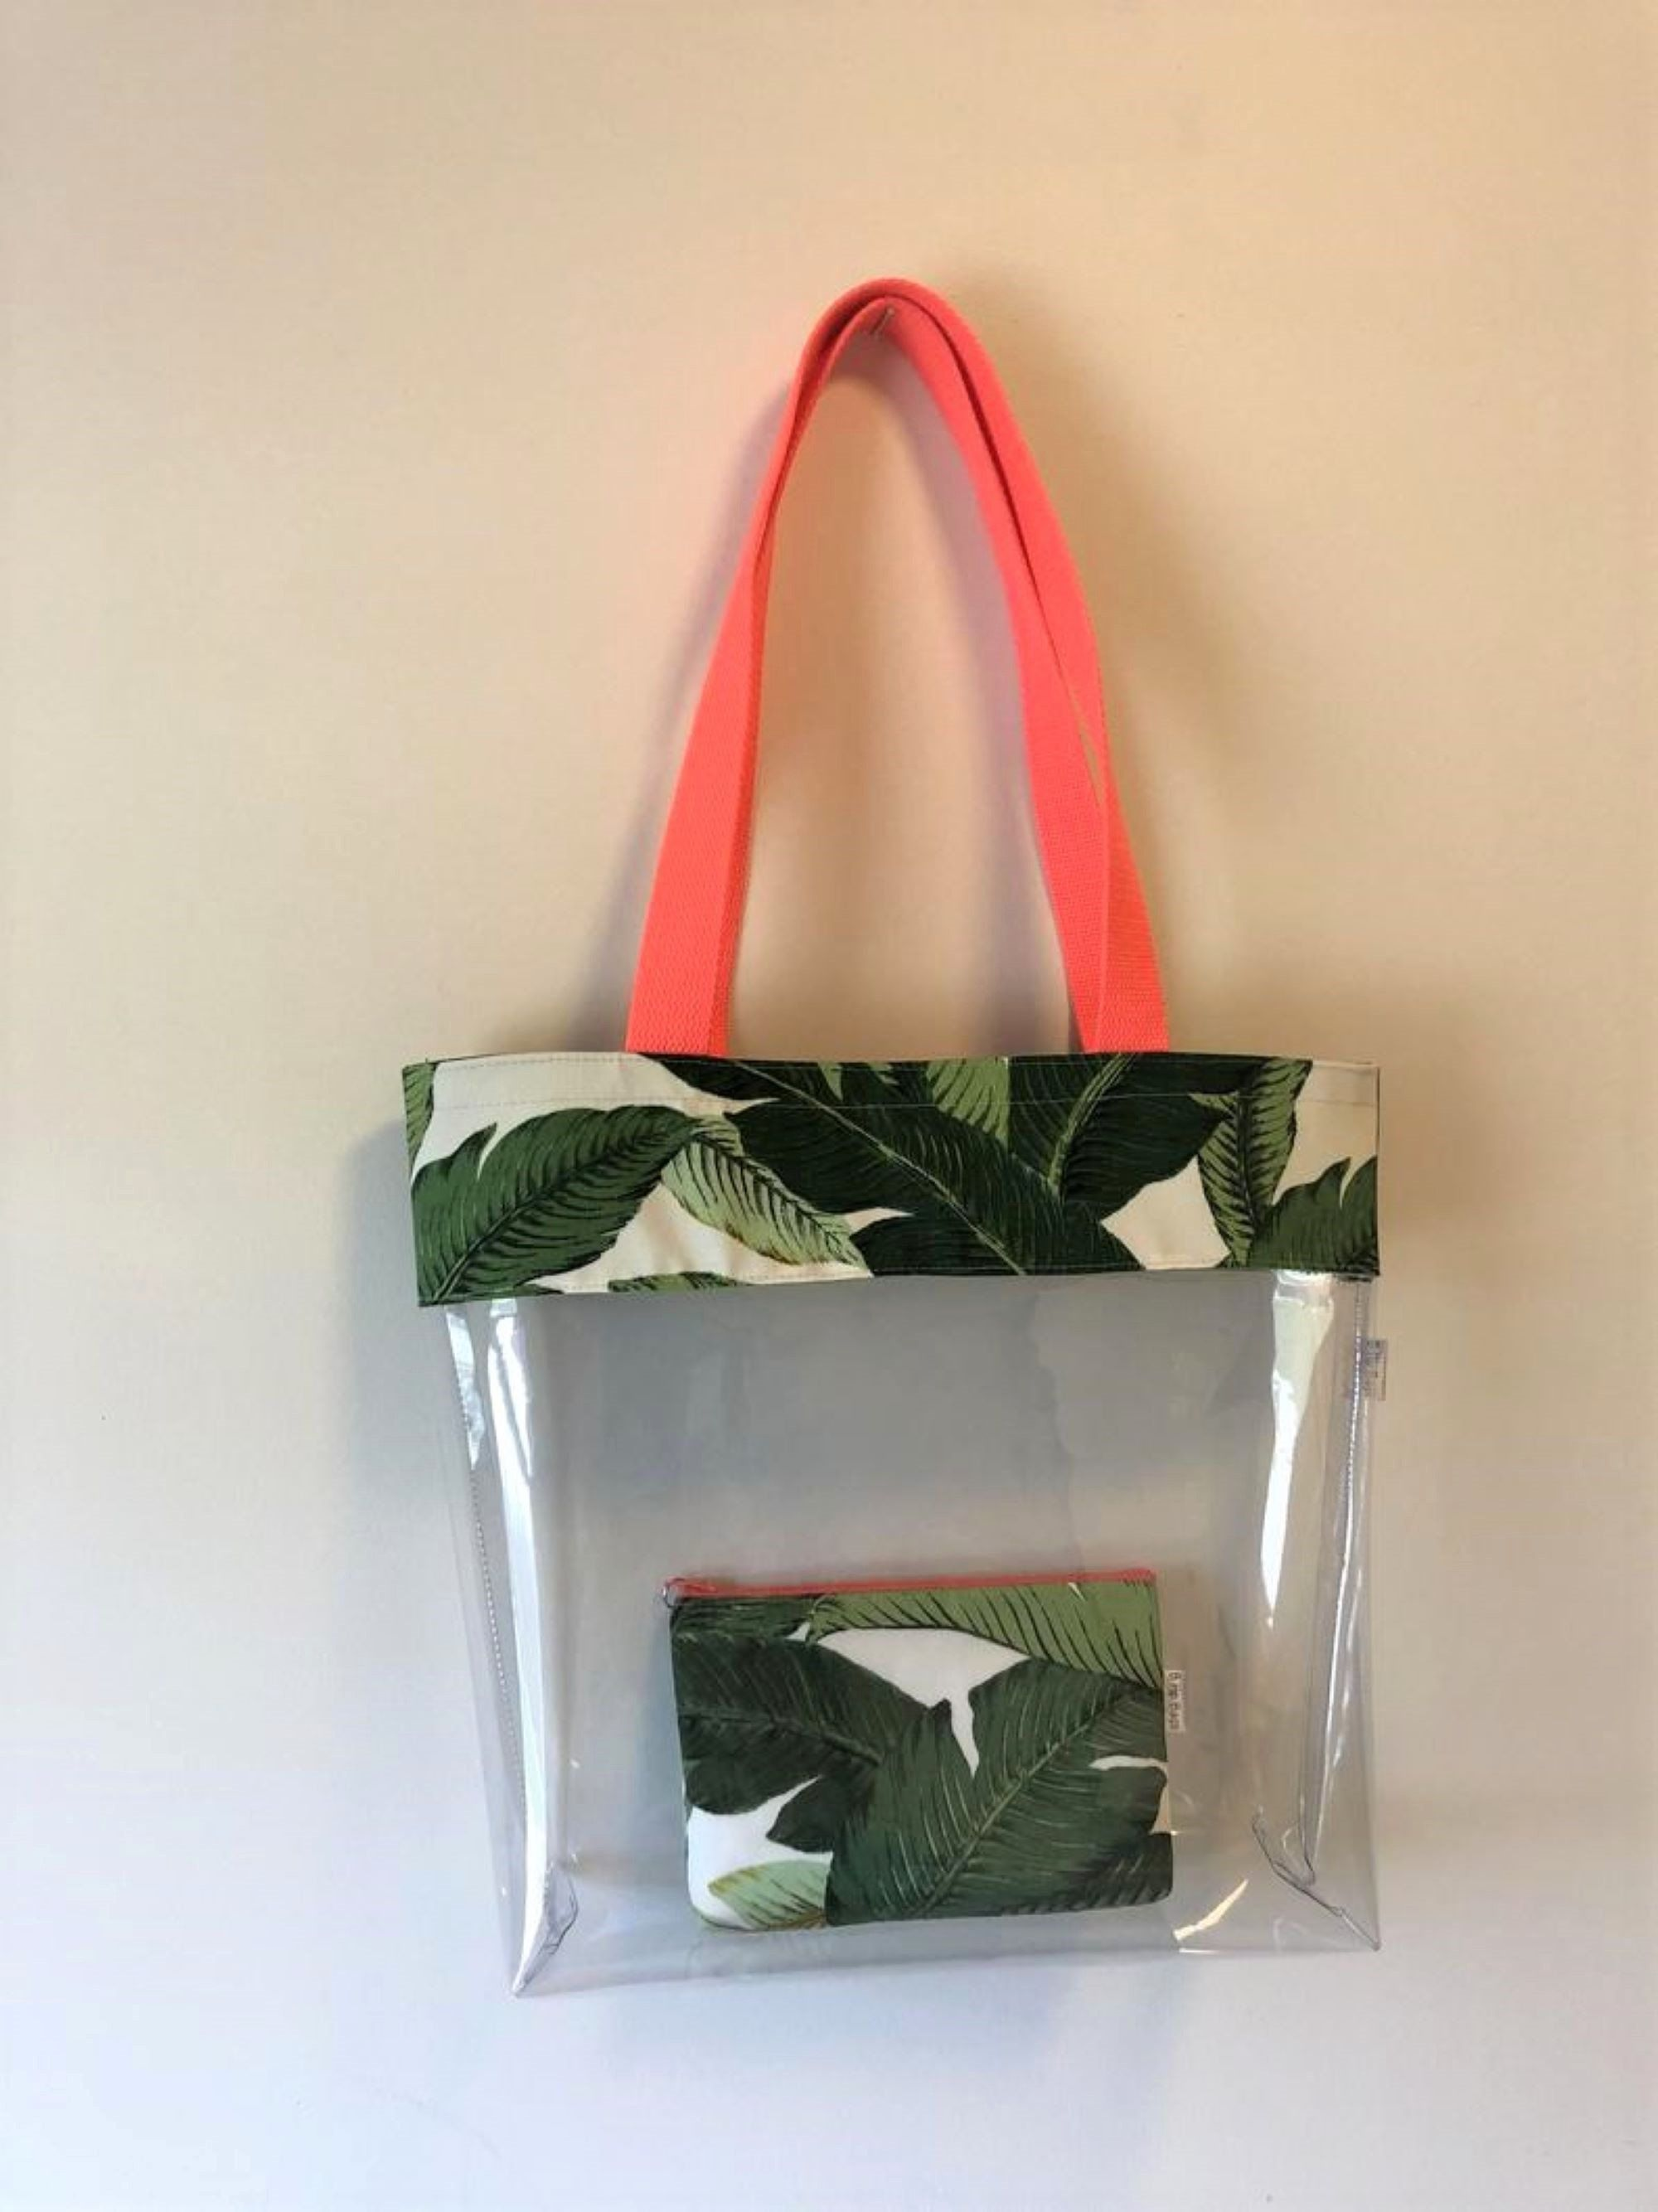 Large Tommy Bahama Leaf Coral Clear Transparent Vinyl Tote Bag Set Waterproof Beach Pool Swim Bag Diaper Bag Set Cosmetic Bag Vacation Bag In 2020 Clear Vinyl Wet Bag Custom Bags